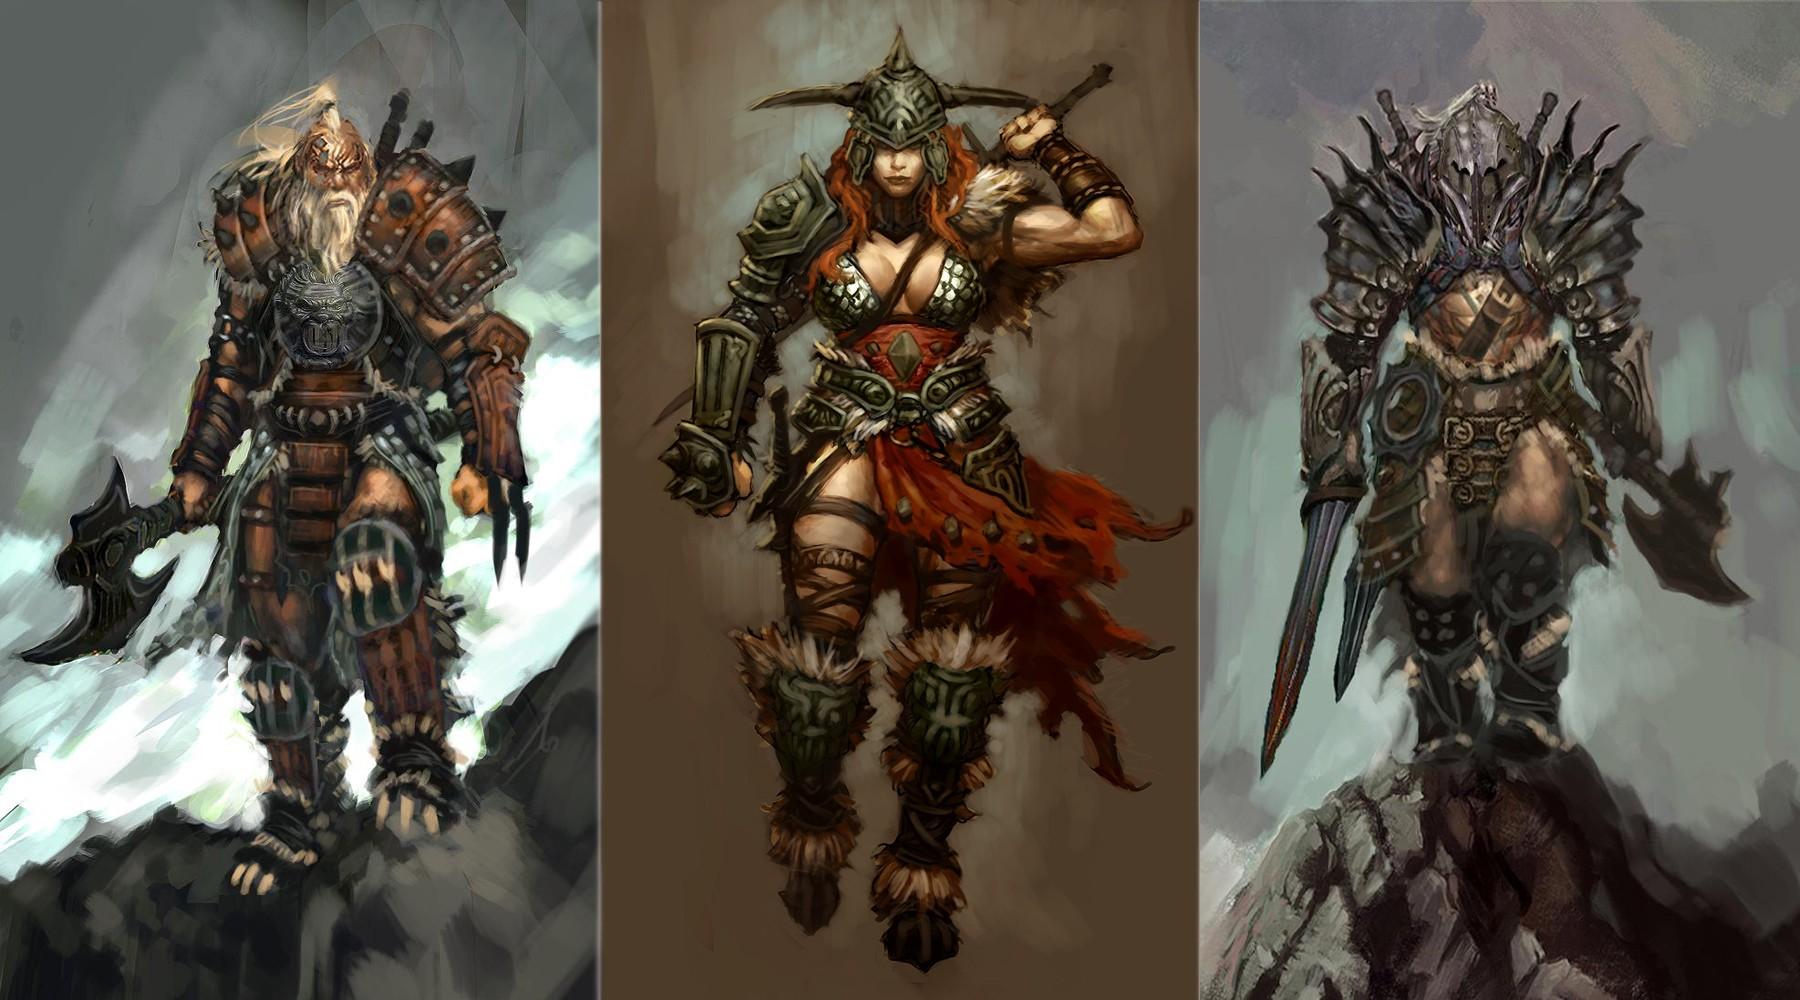 Diablo 3 Barbarian Wallpaper Diablo 3 wallpaper barbarian 1800x1000